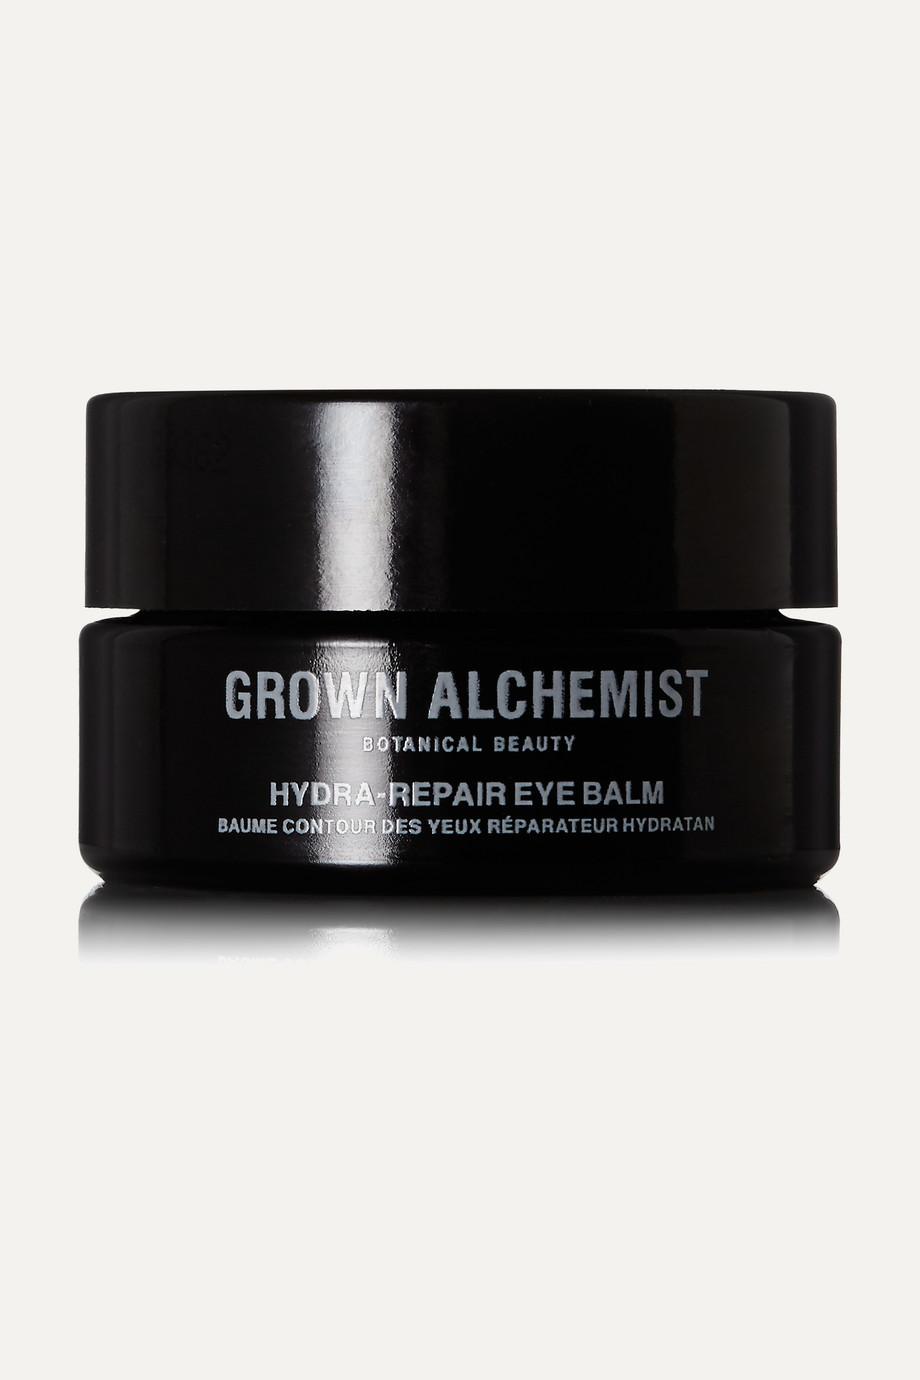 Grown Alchemist Intensive Hydra-Repair Eye Balm, 15 ml – Augencreme